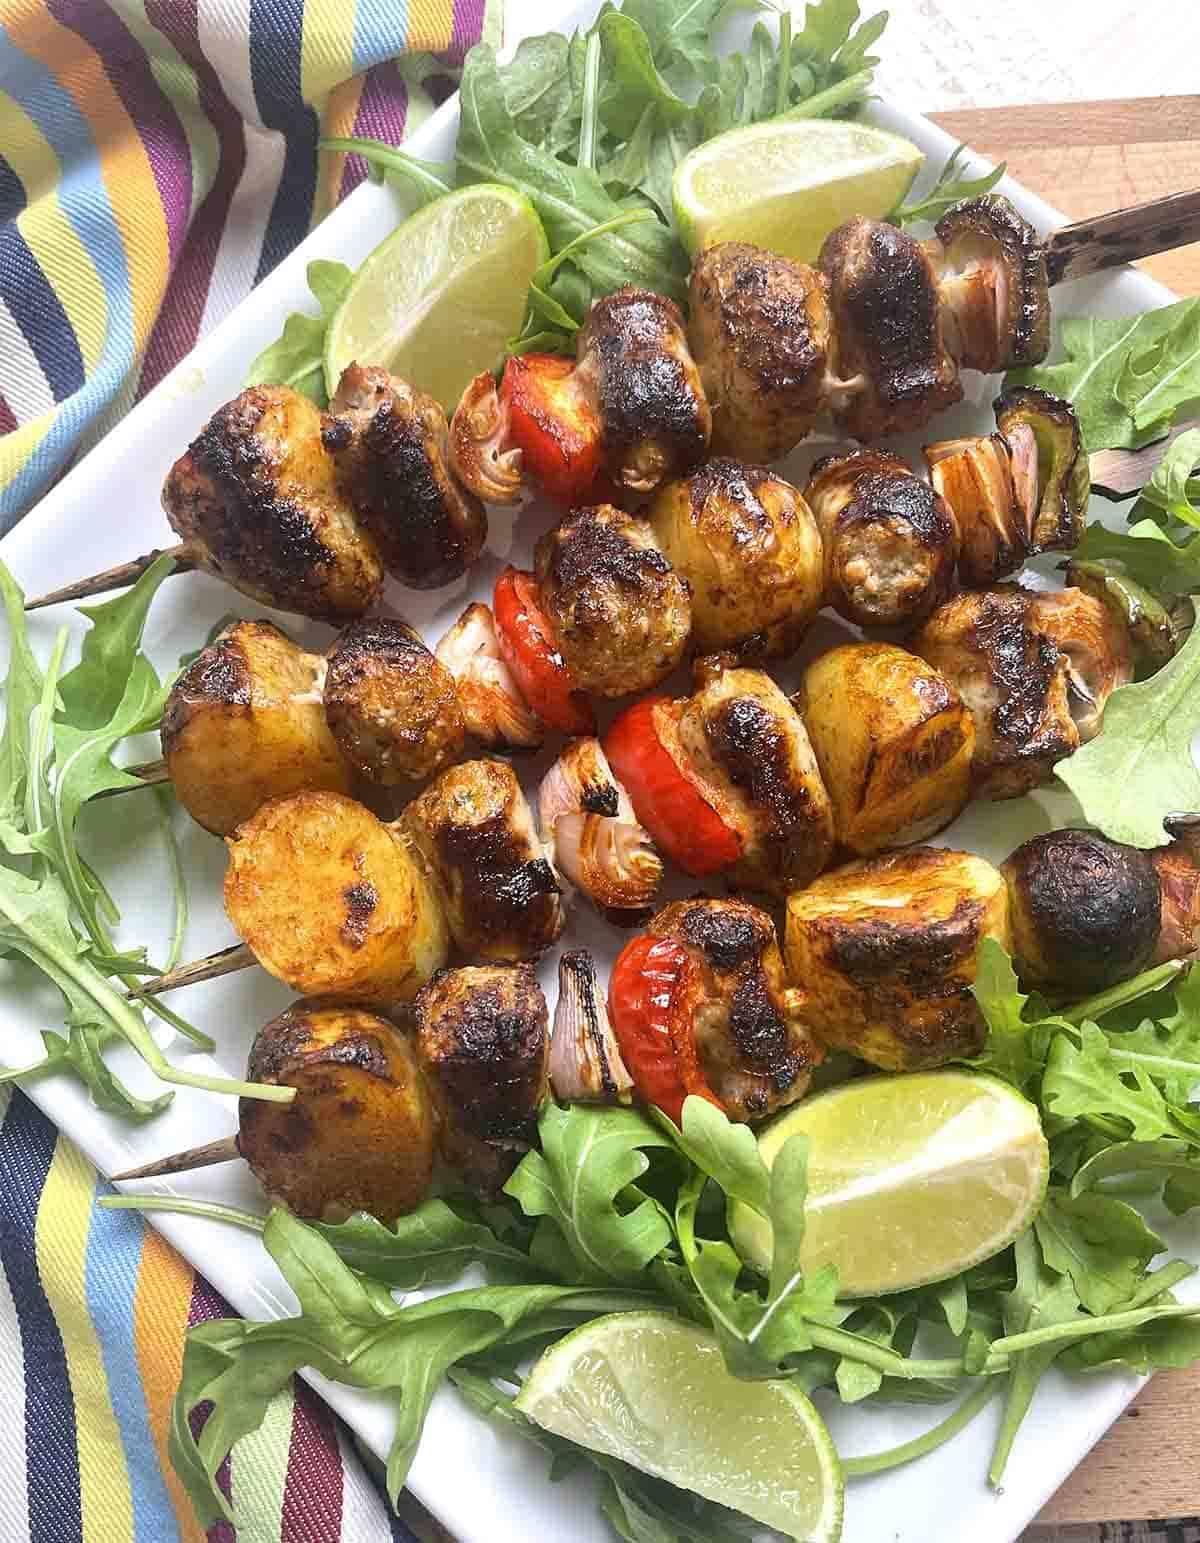 sausage kebabs on a plate.